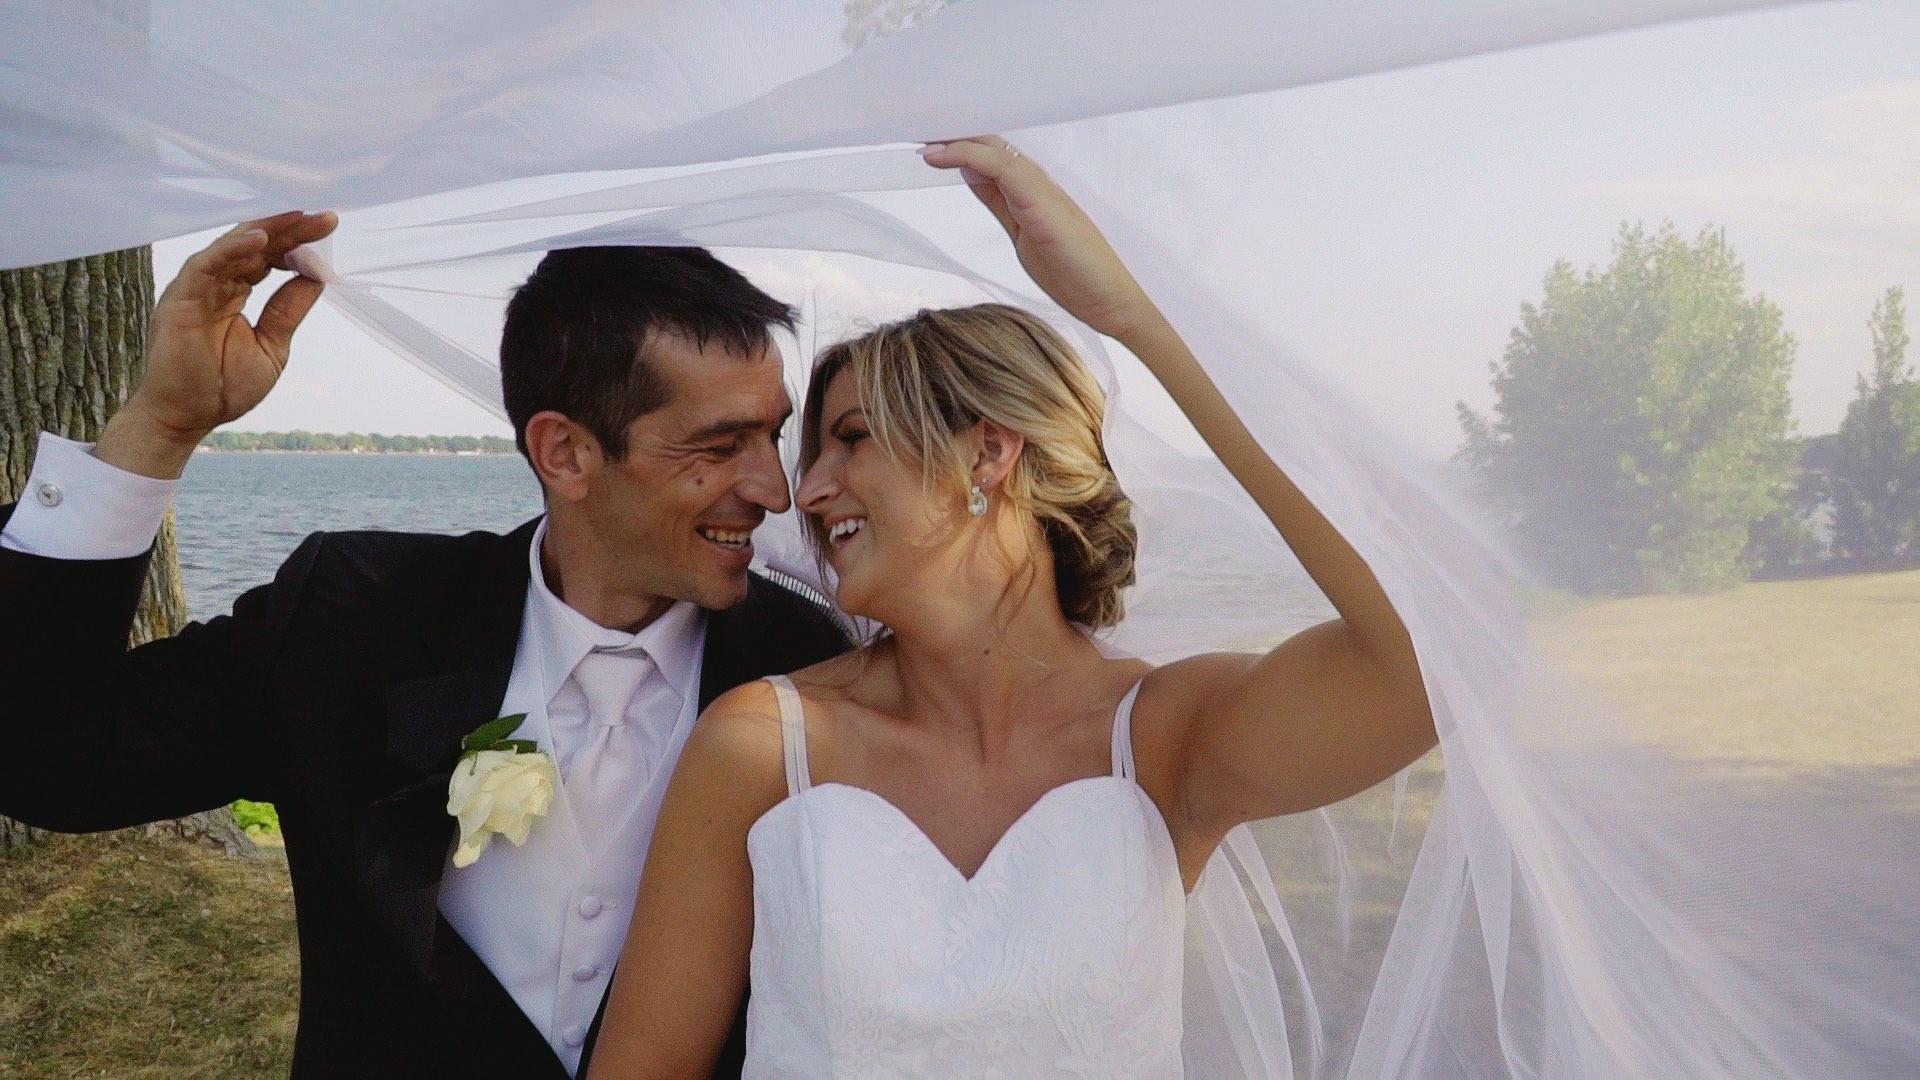 Film de mariage, vidéo de mariage, couple de mariés